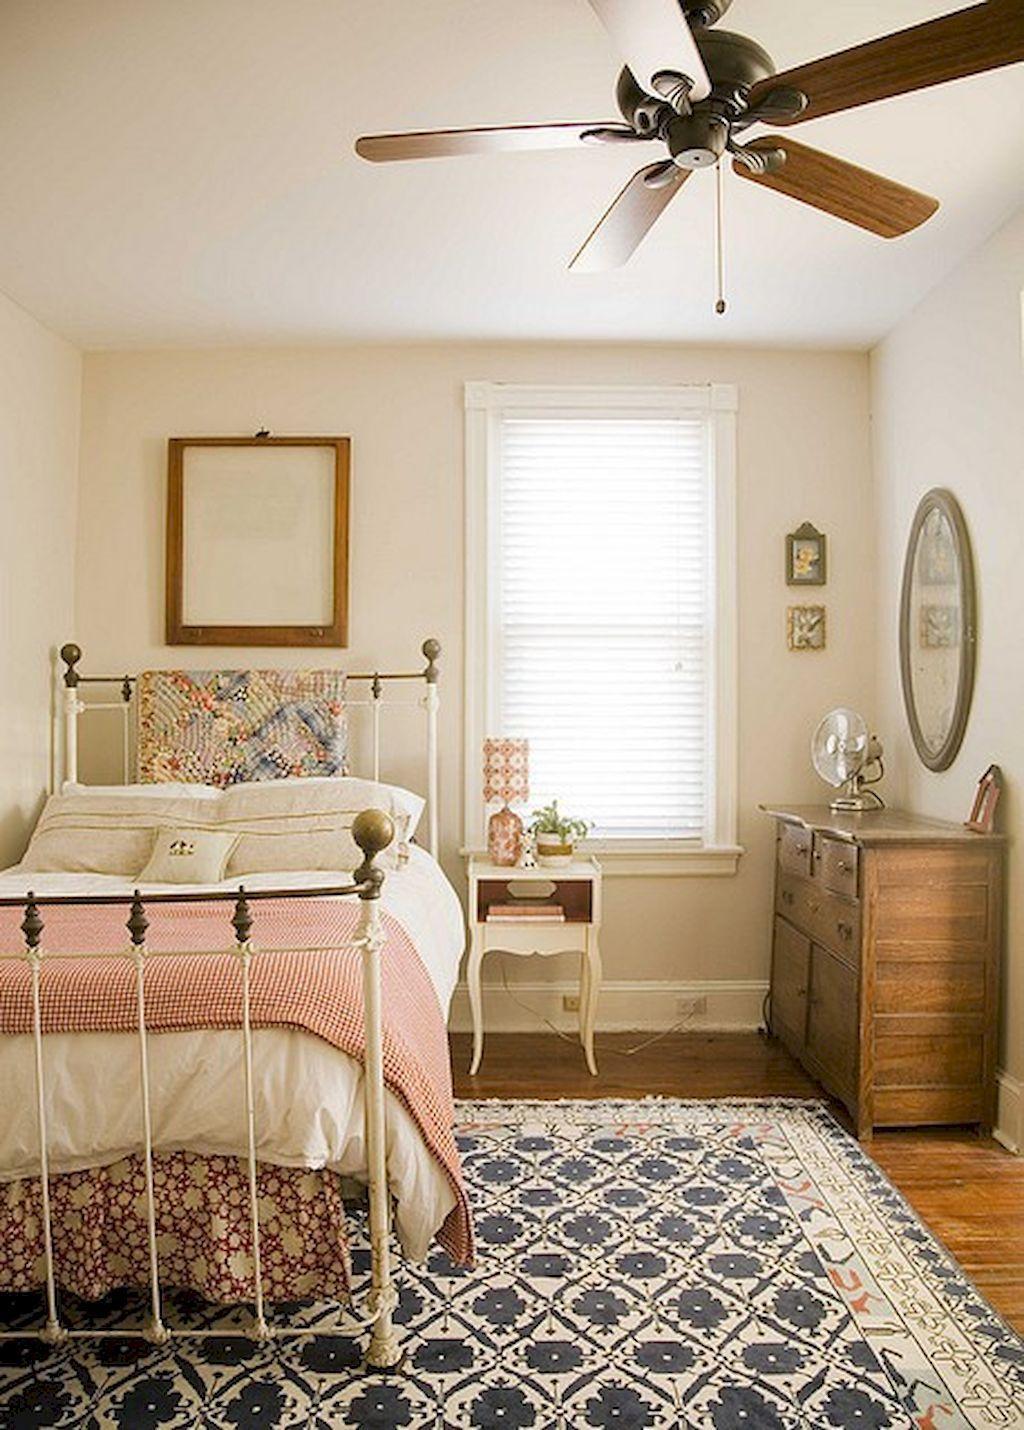 40 Great Vintage Bedroom Ideas Decorating Bedroom Vintage Small Room Design Bedroom Design